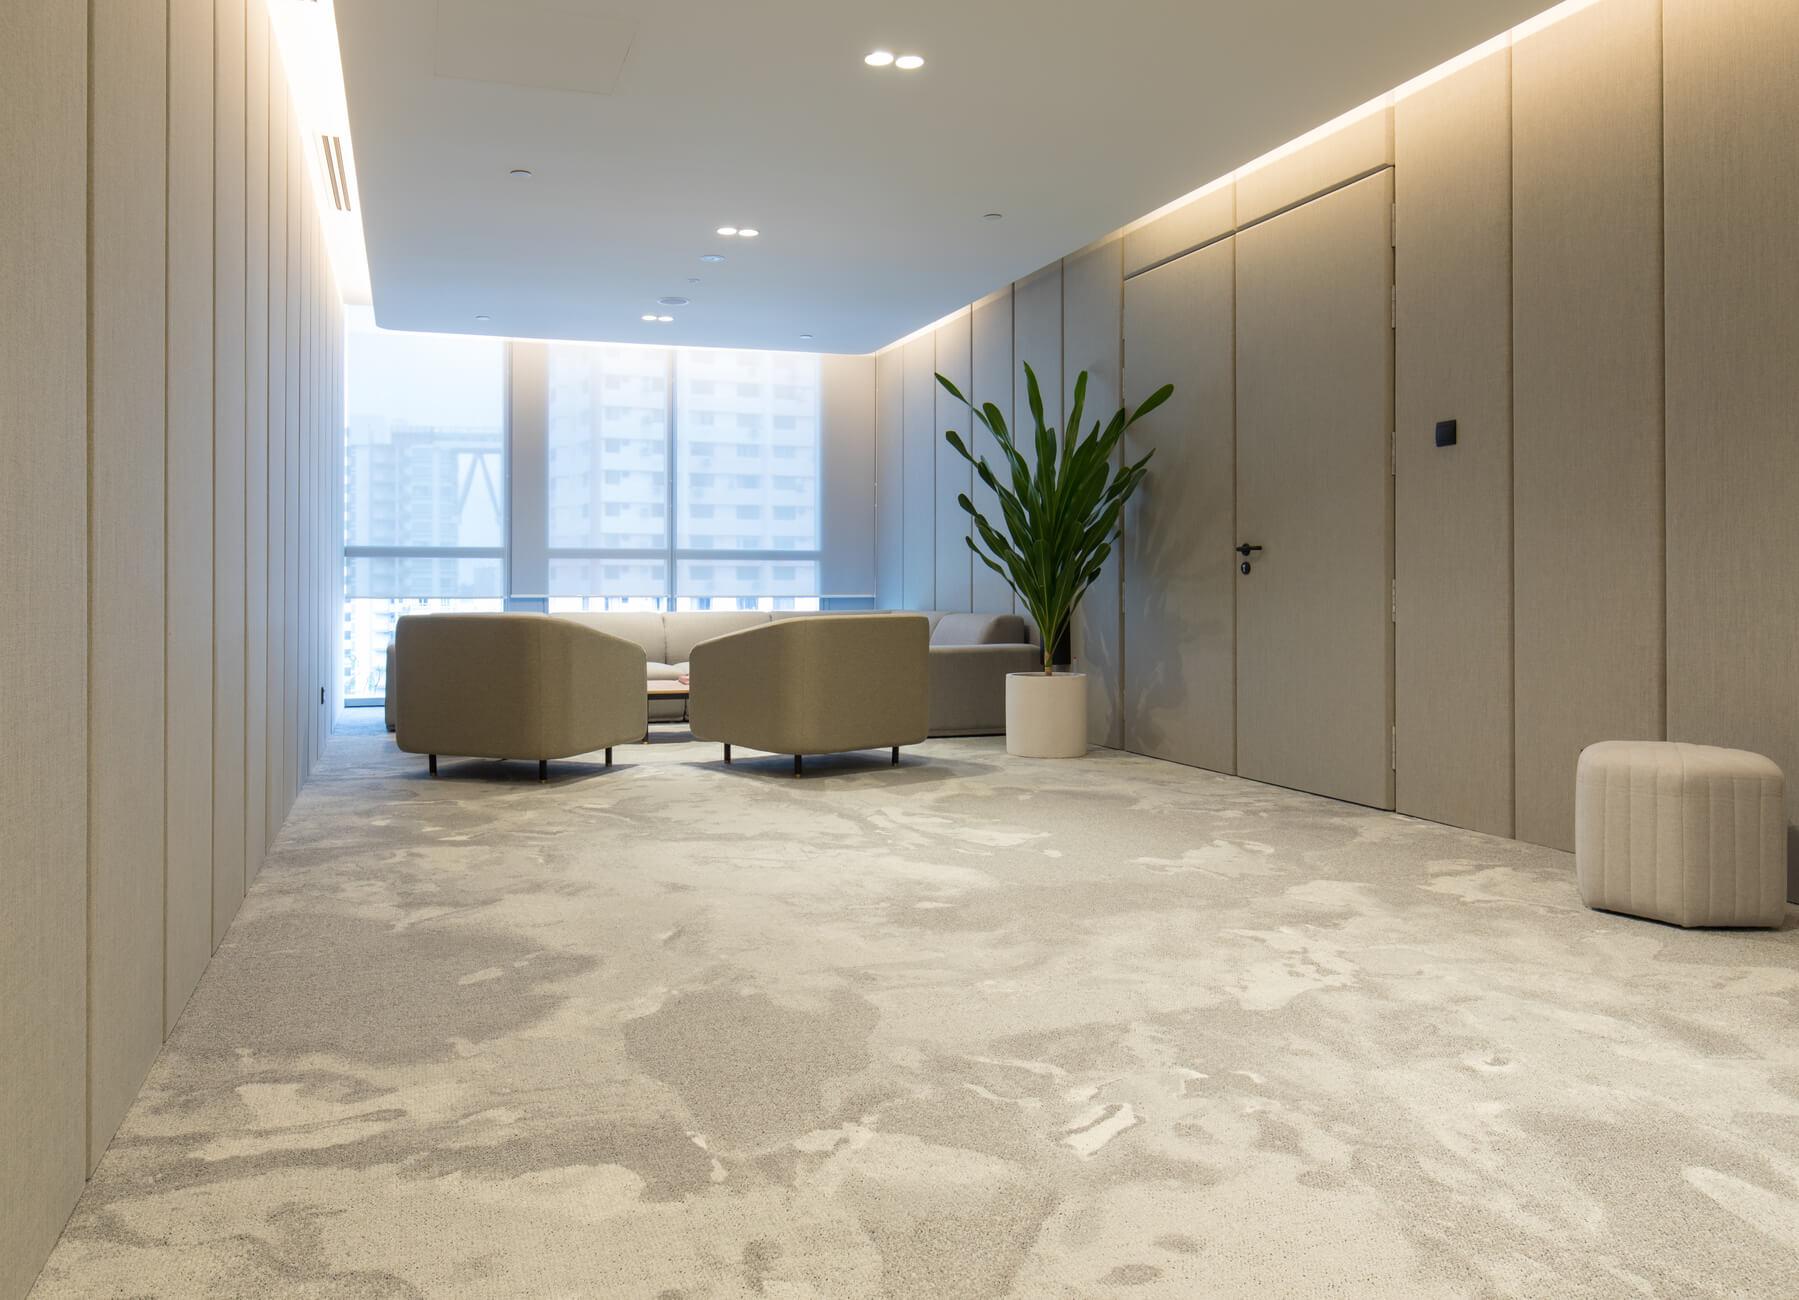 REFORM TERRA-SMRT Office-Singapore